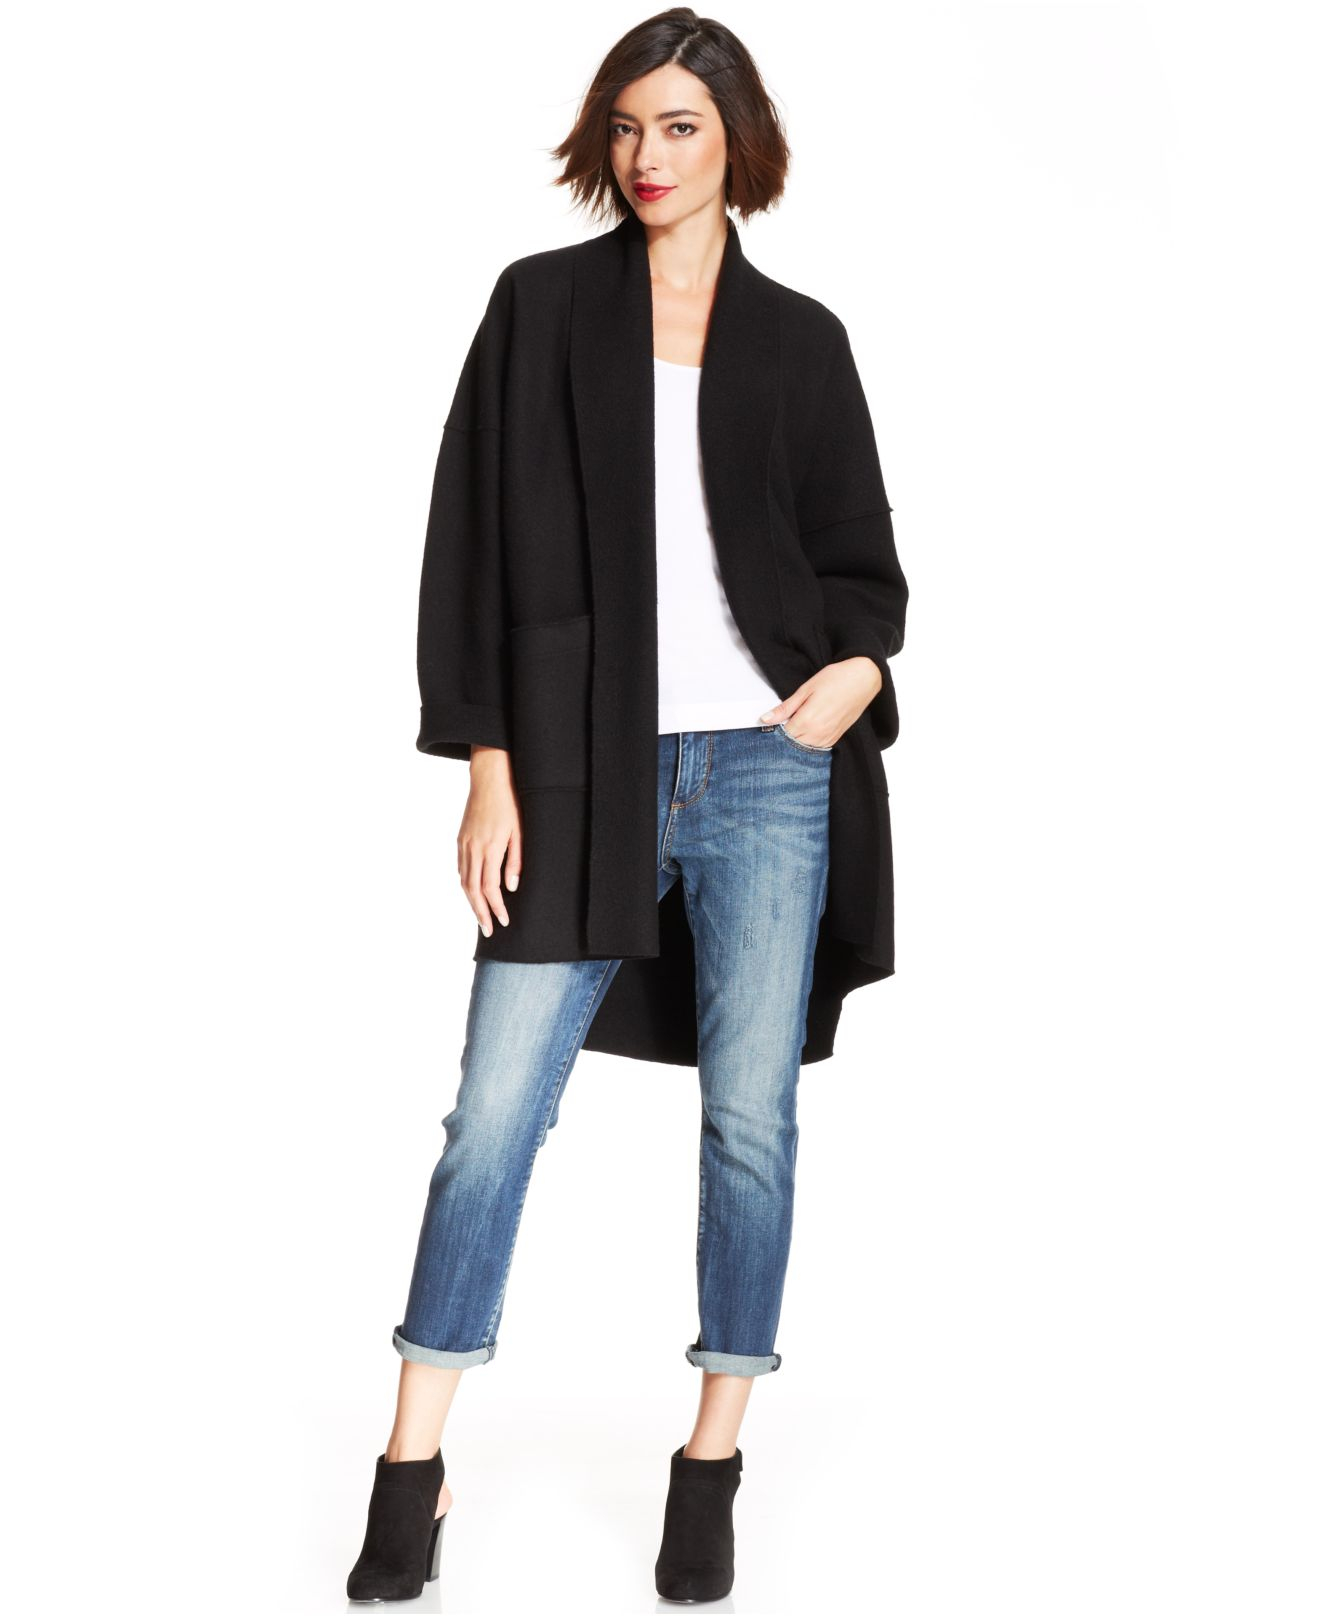 Eileen fisher Merino-Wool Kimono Cardigan in Black   Lyst